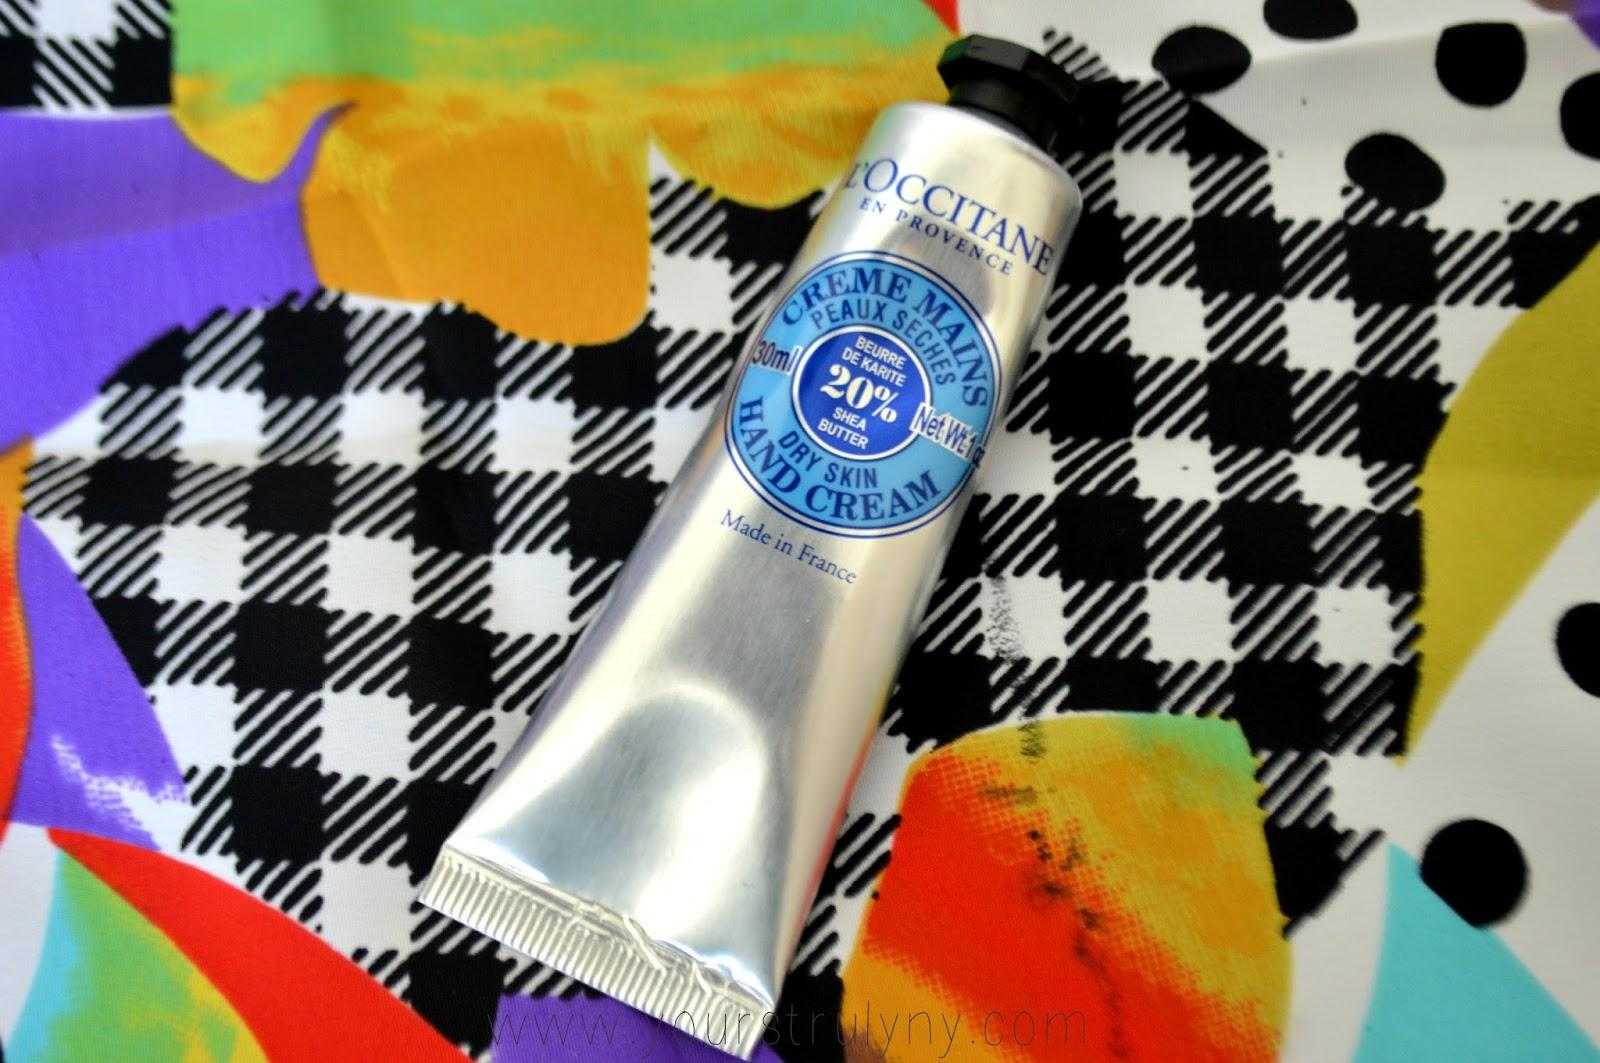 L'Occitane Dry Skin Hand Cream